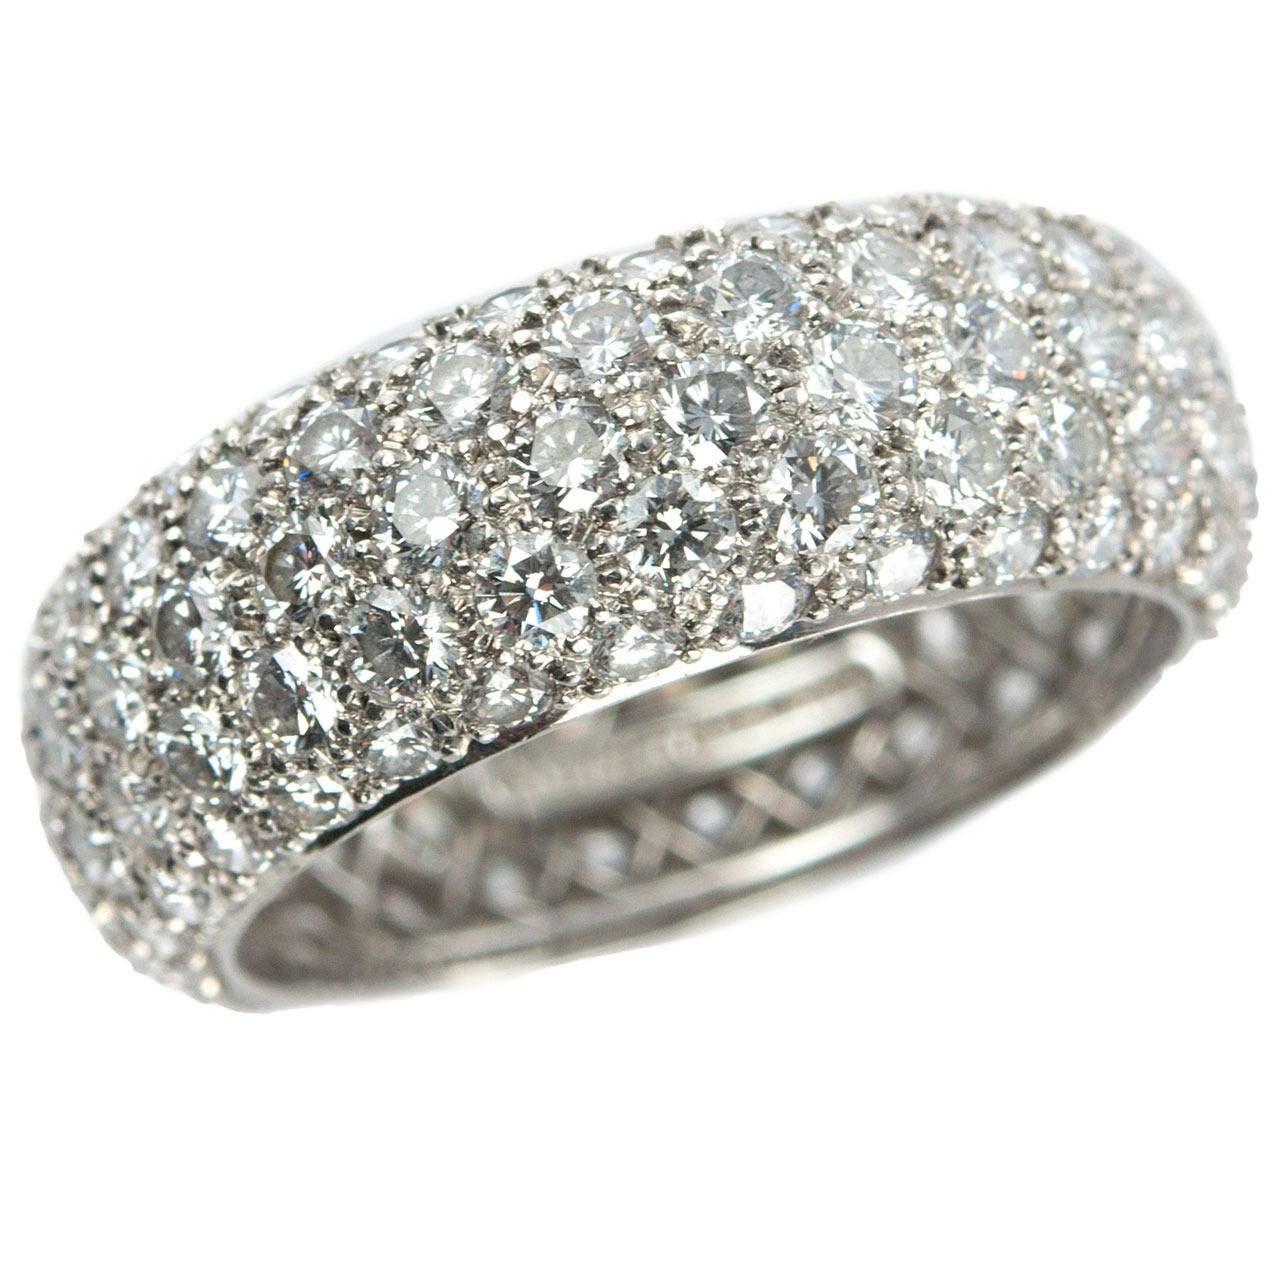 Tiffany Etoile Five Row Diamond Platinum Band Ring At 1stdibs